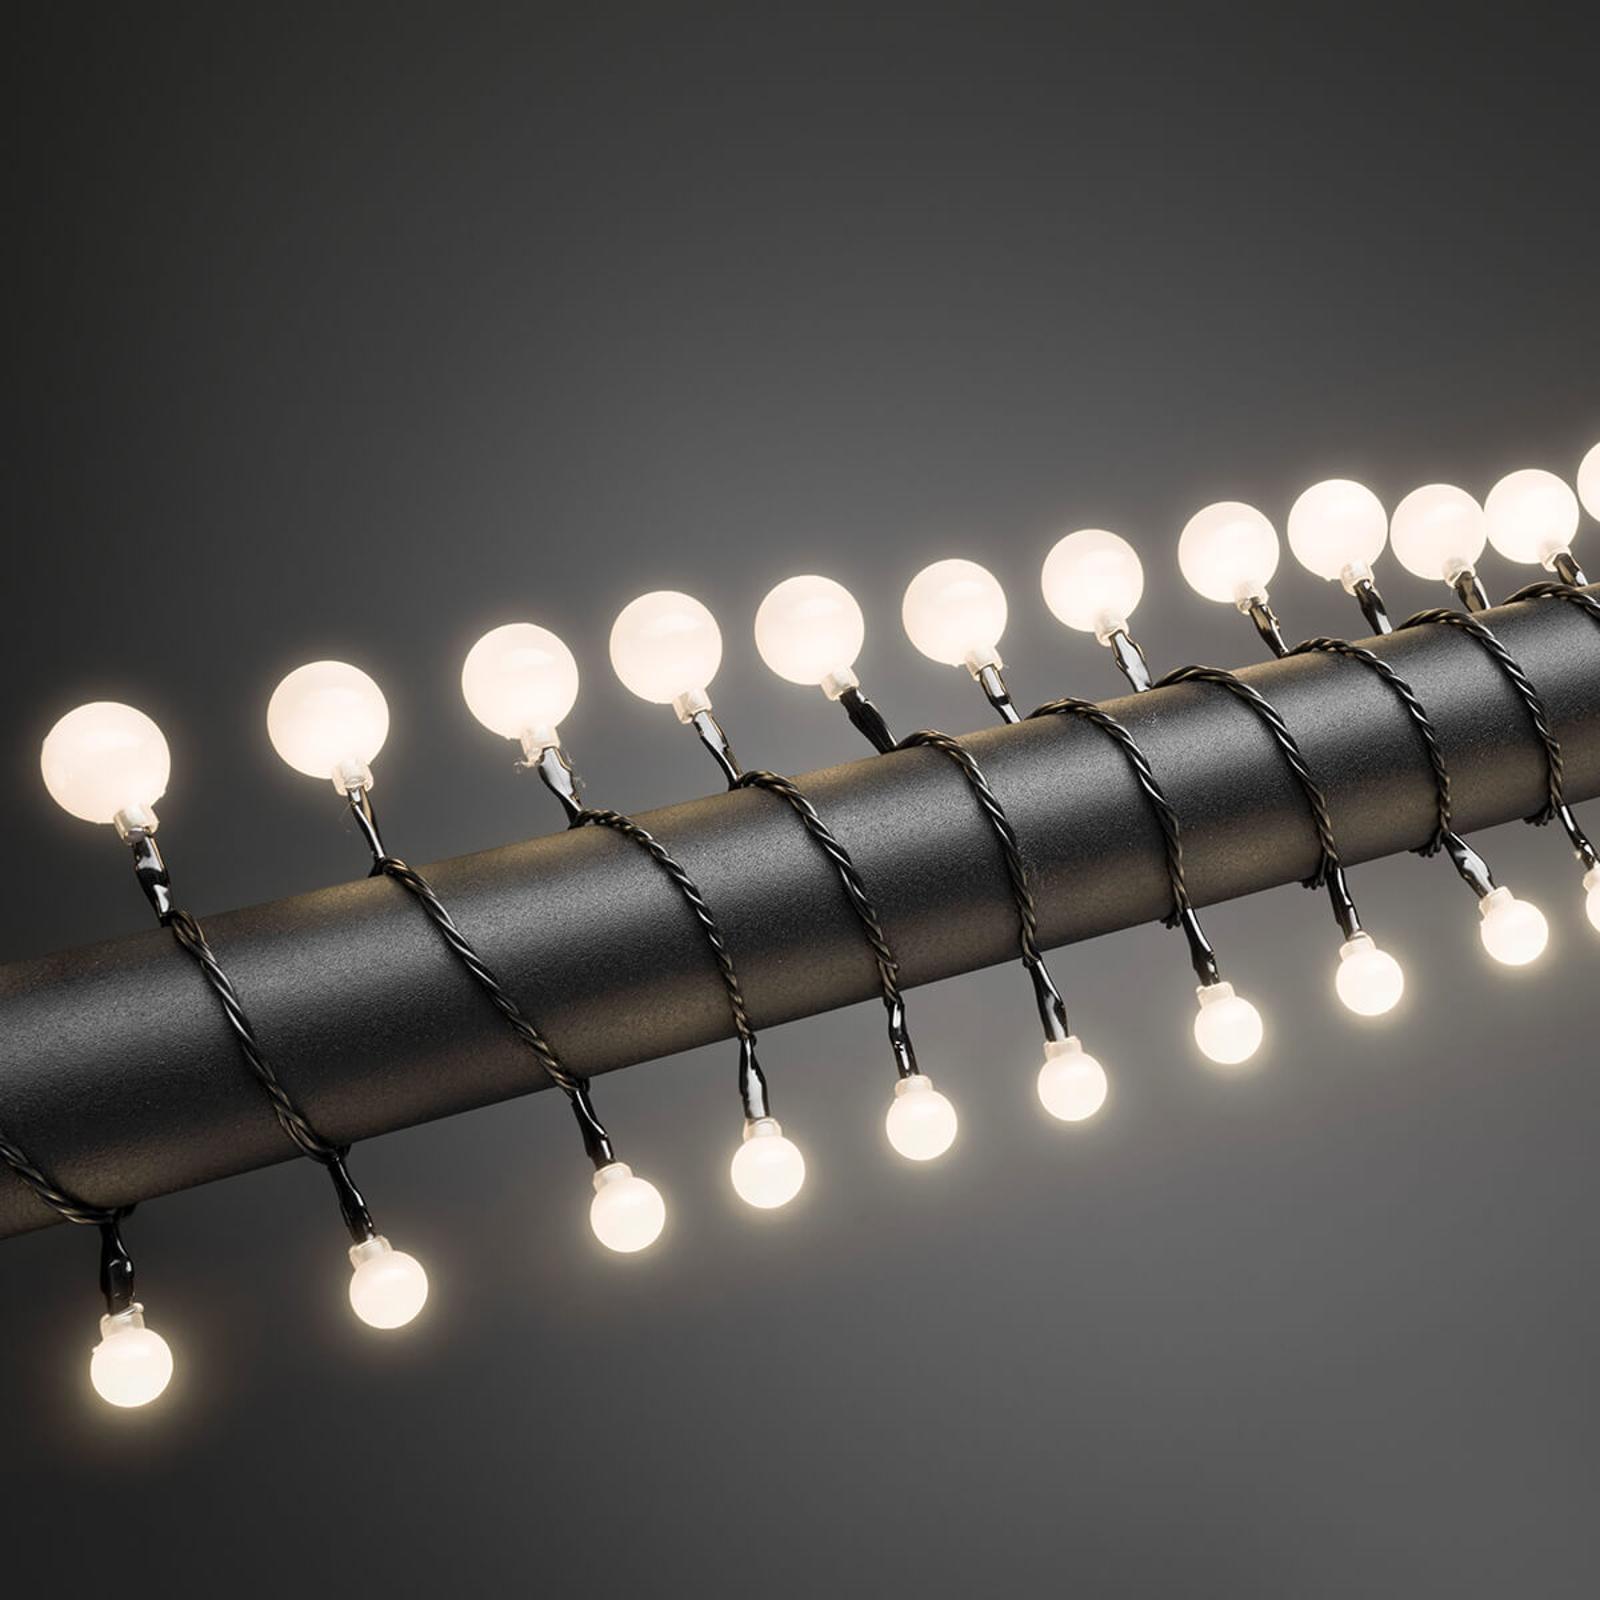 Kugle-LED-lyskæde, varmhvid, 80 lyskilder